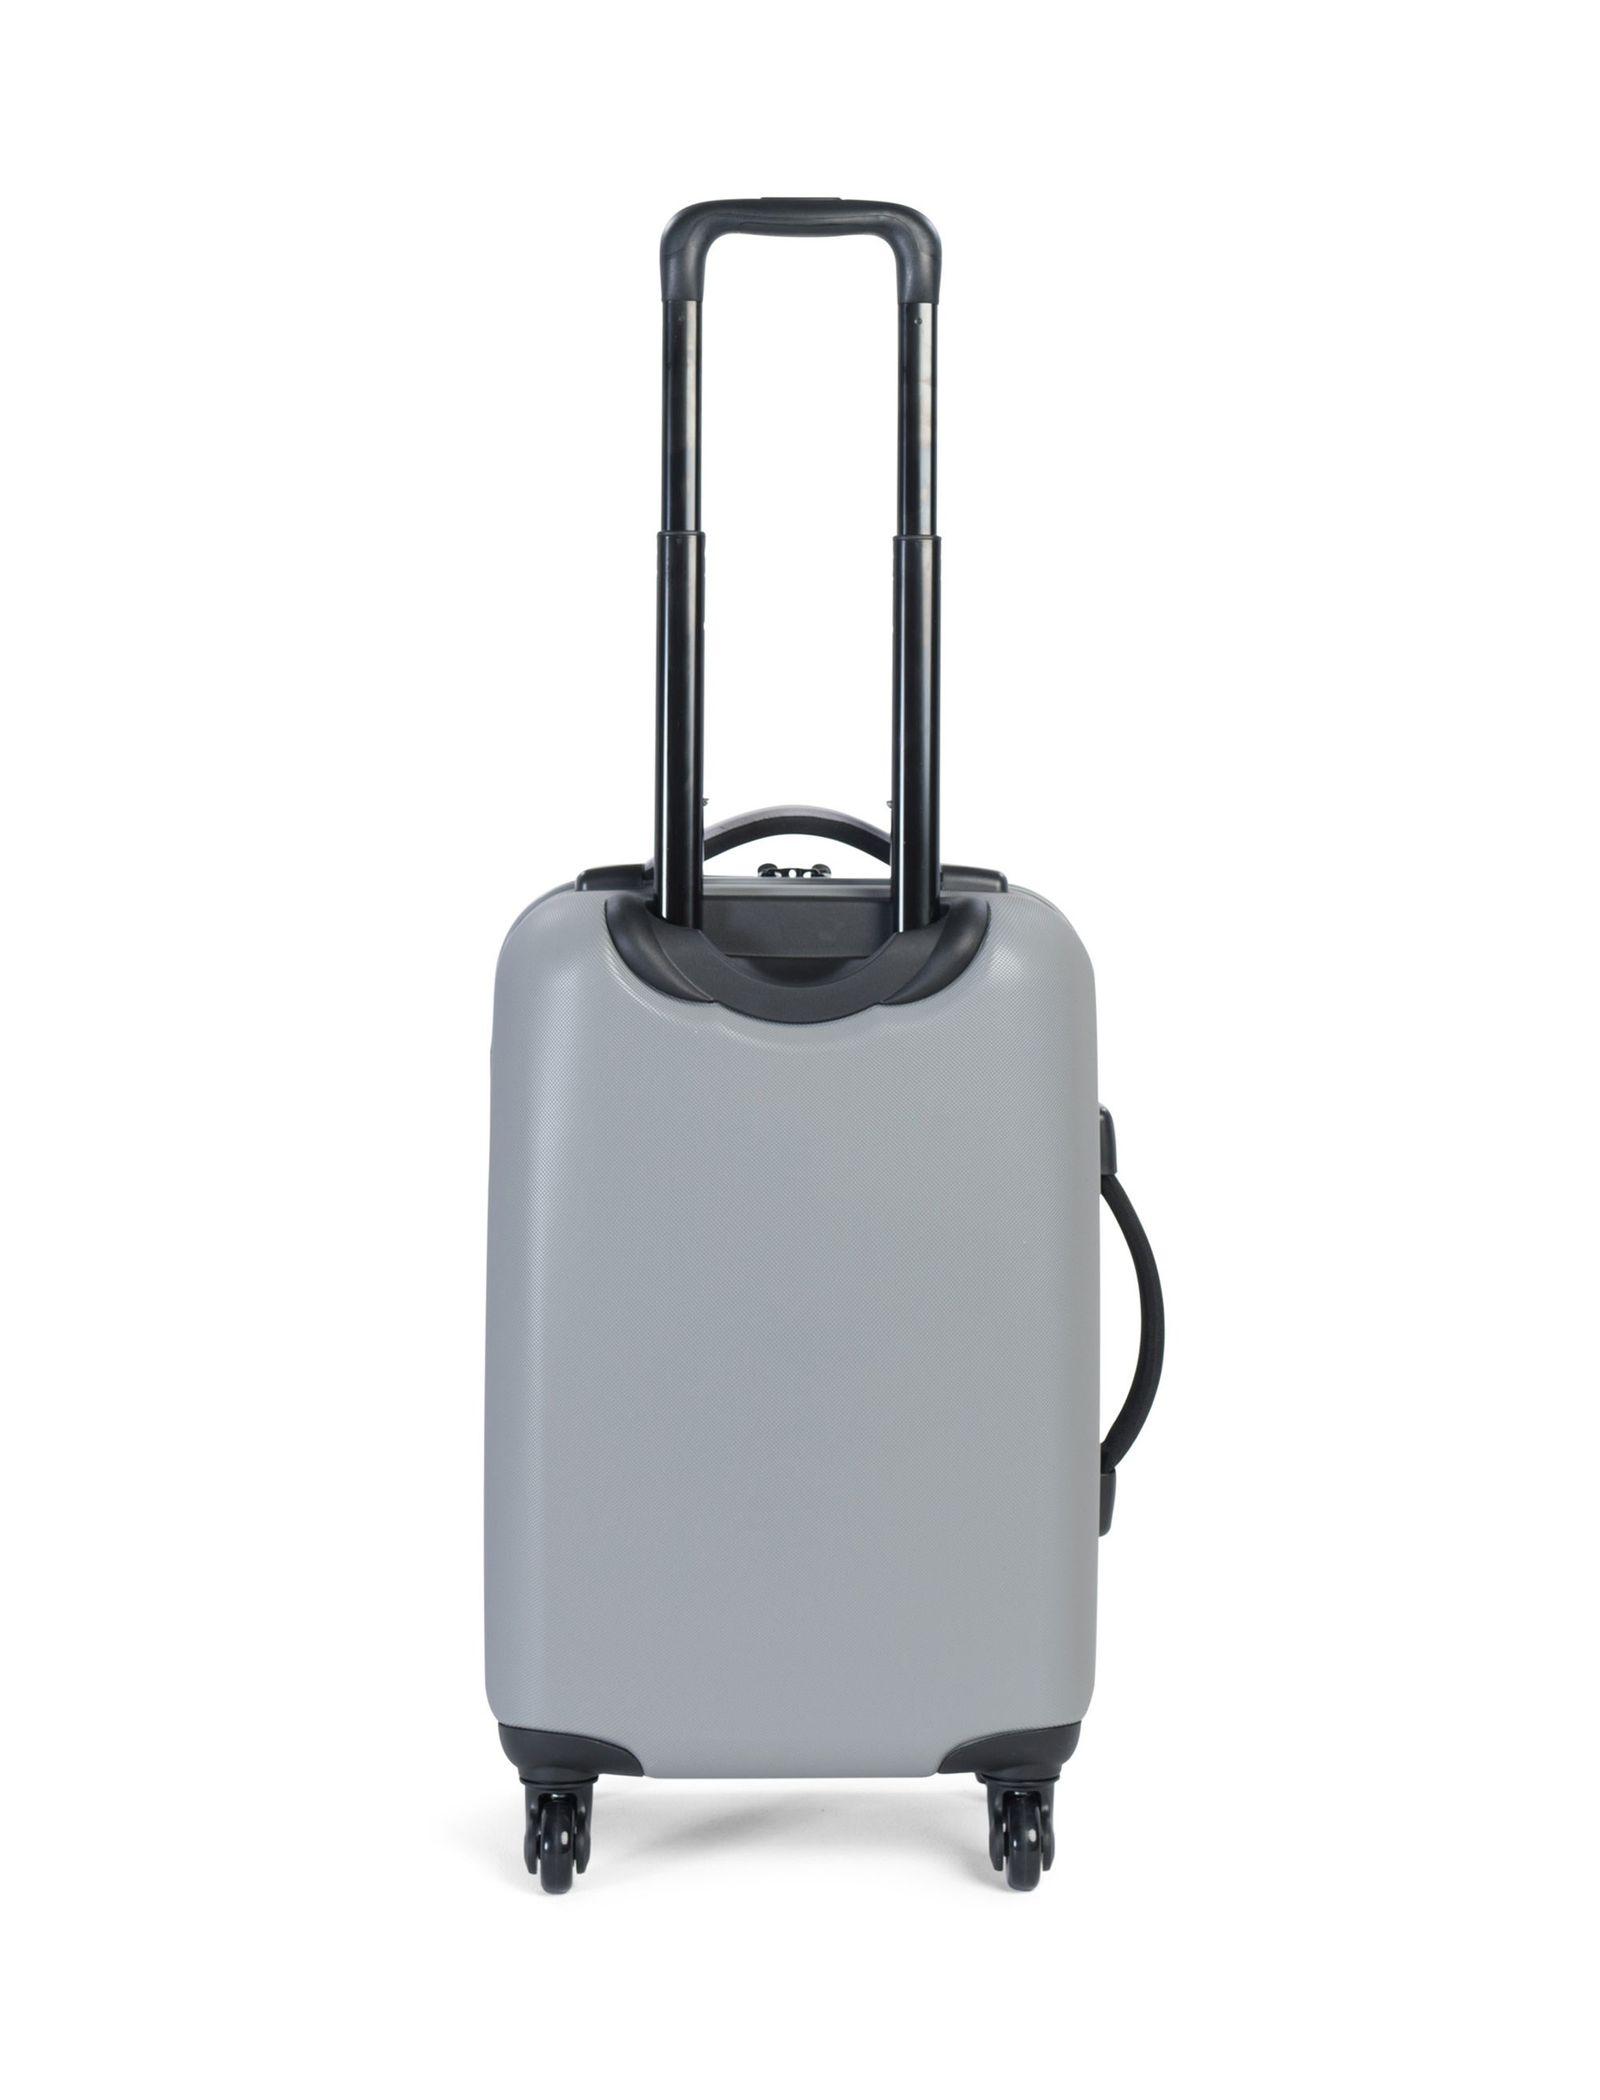 چمدان Trade Small - هرشل - طوسي - 5